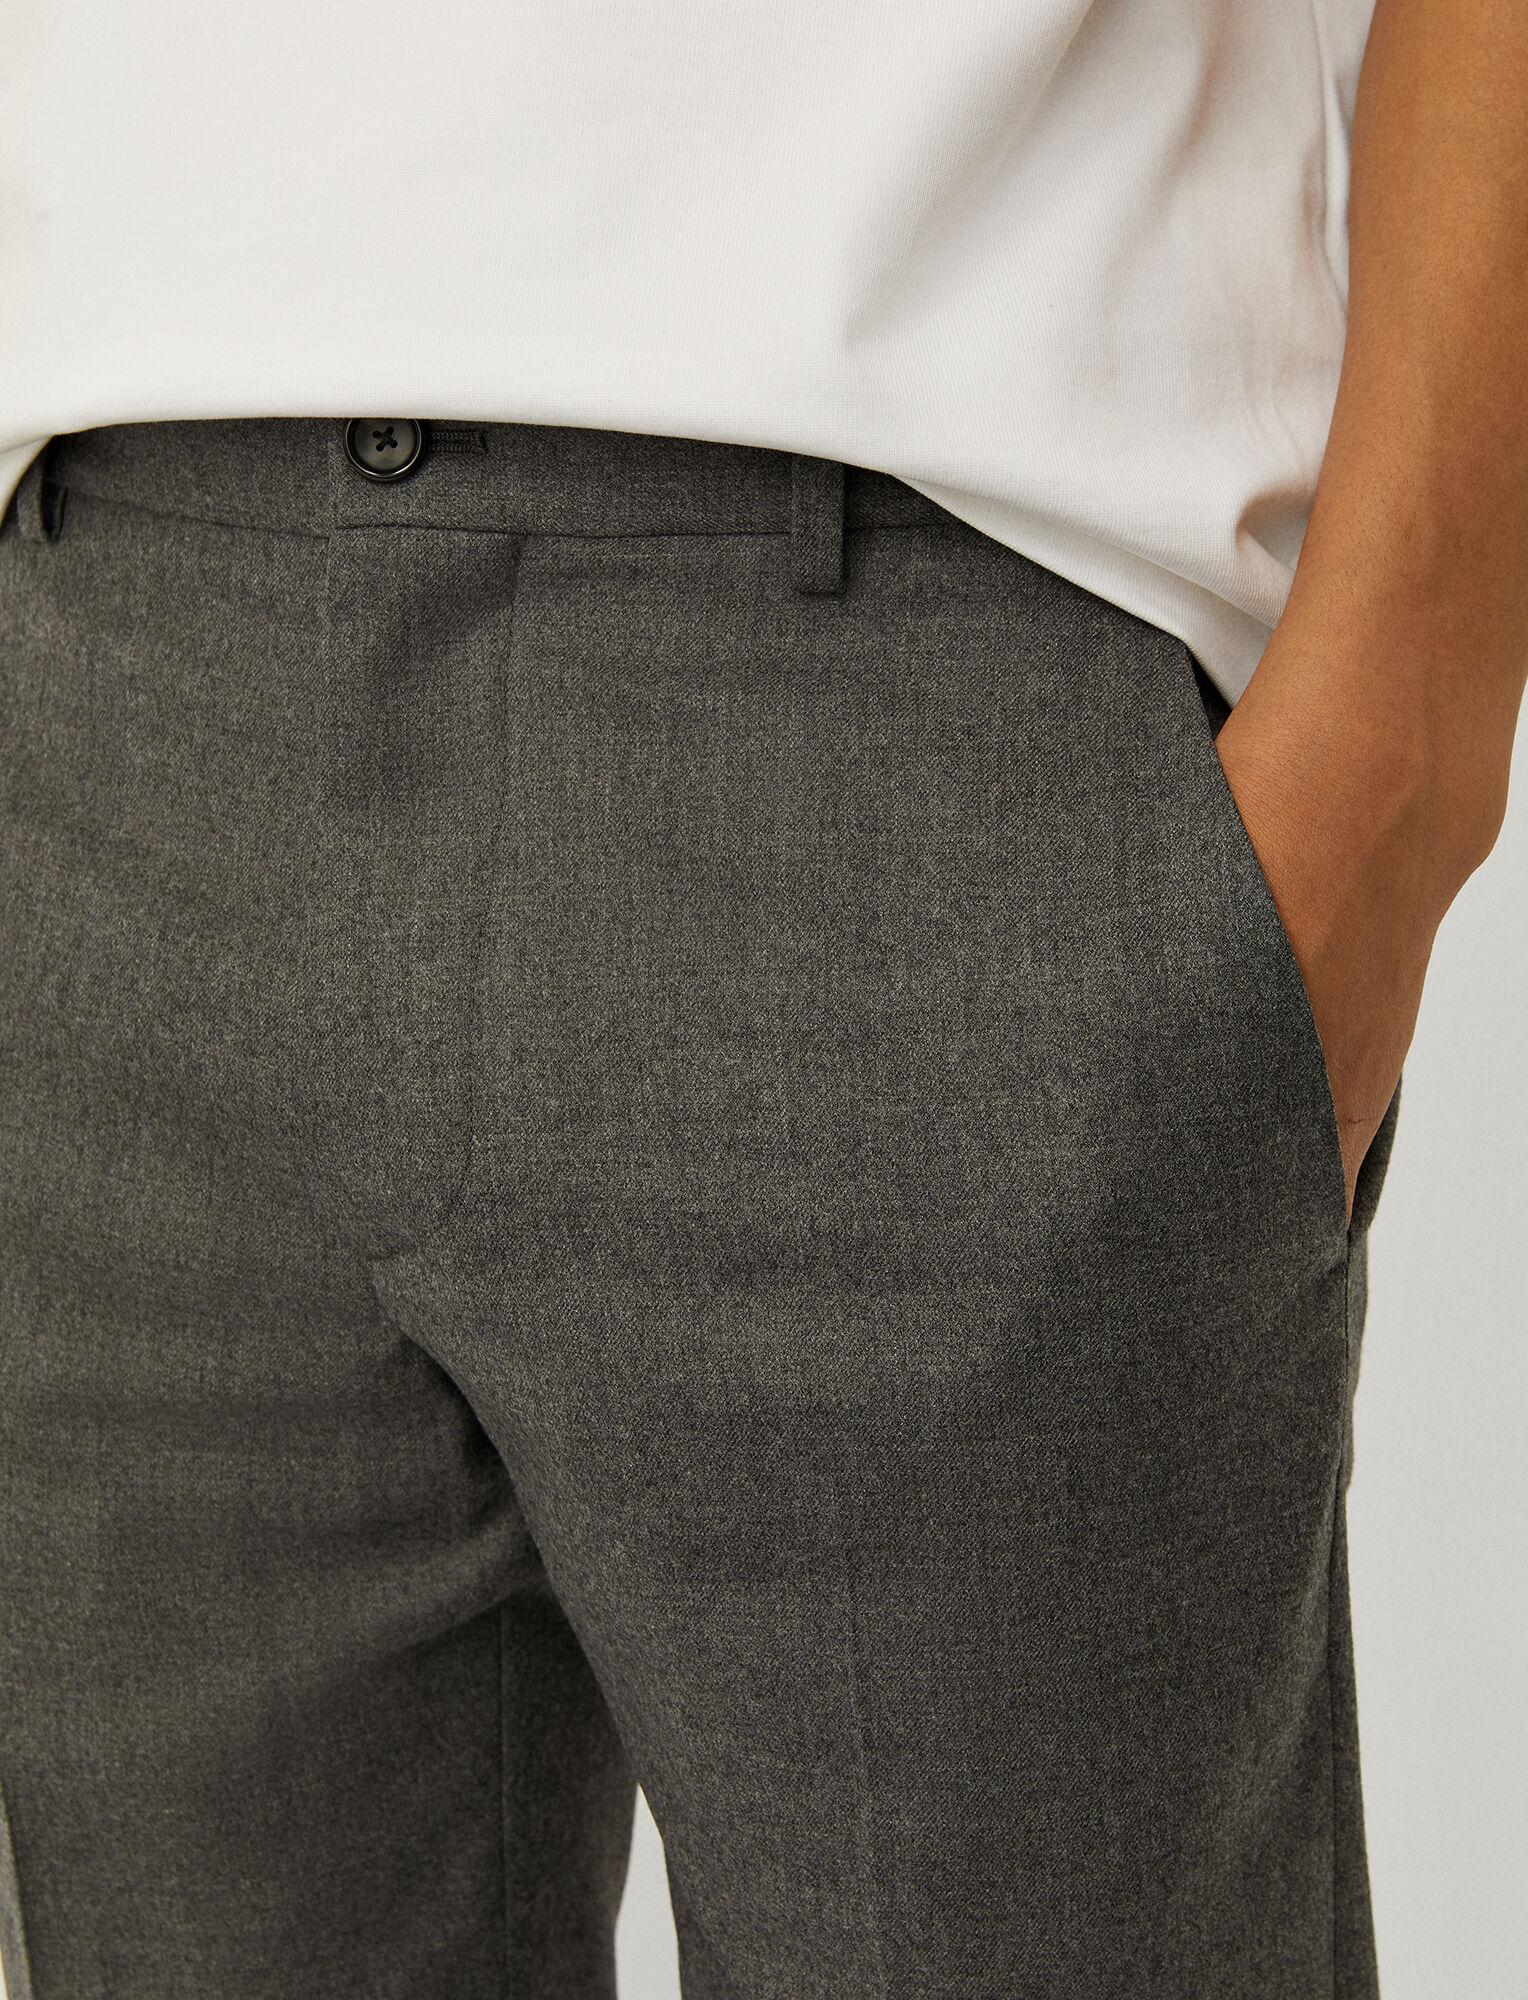 Joseph, Flannel Stretch Jack Trousers, in LIGHT GREY